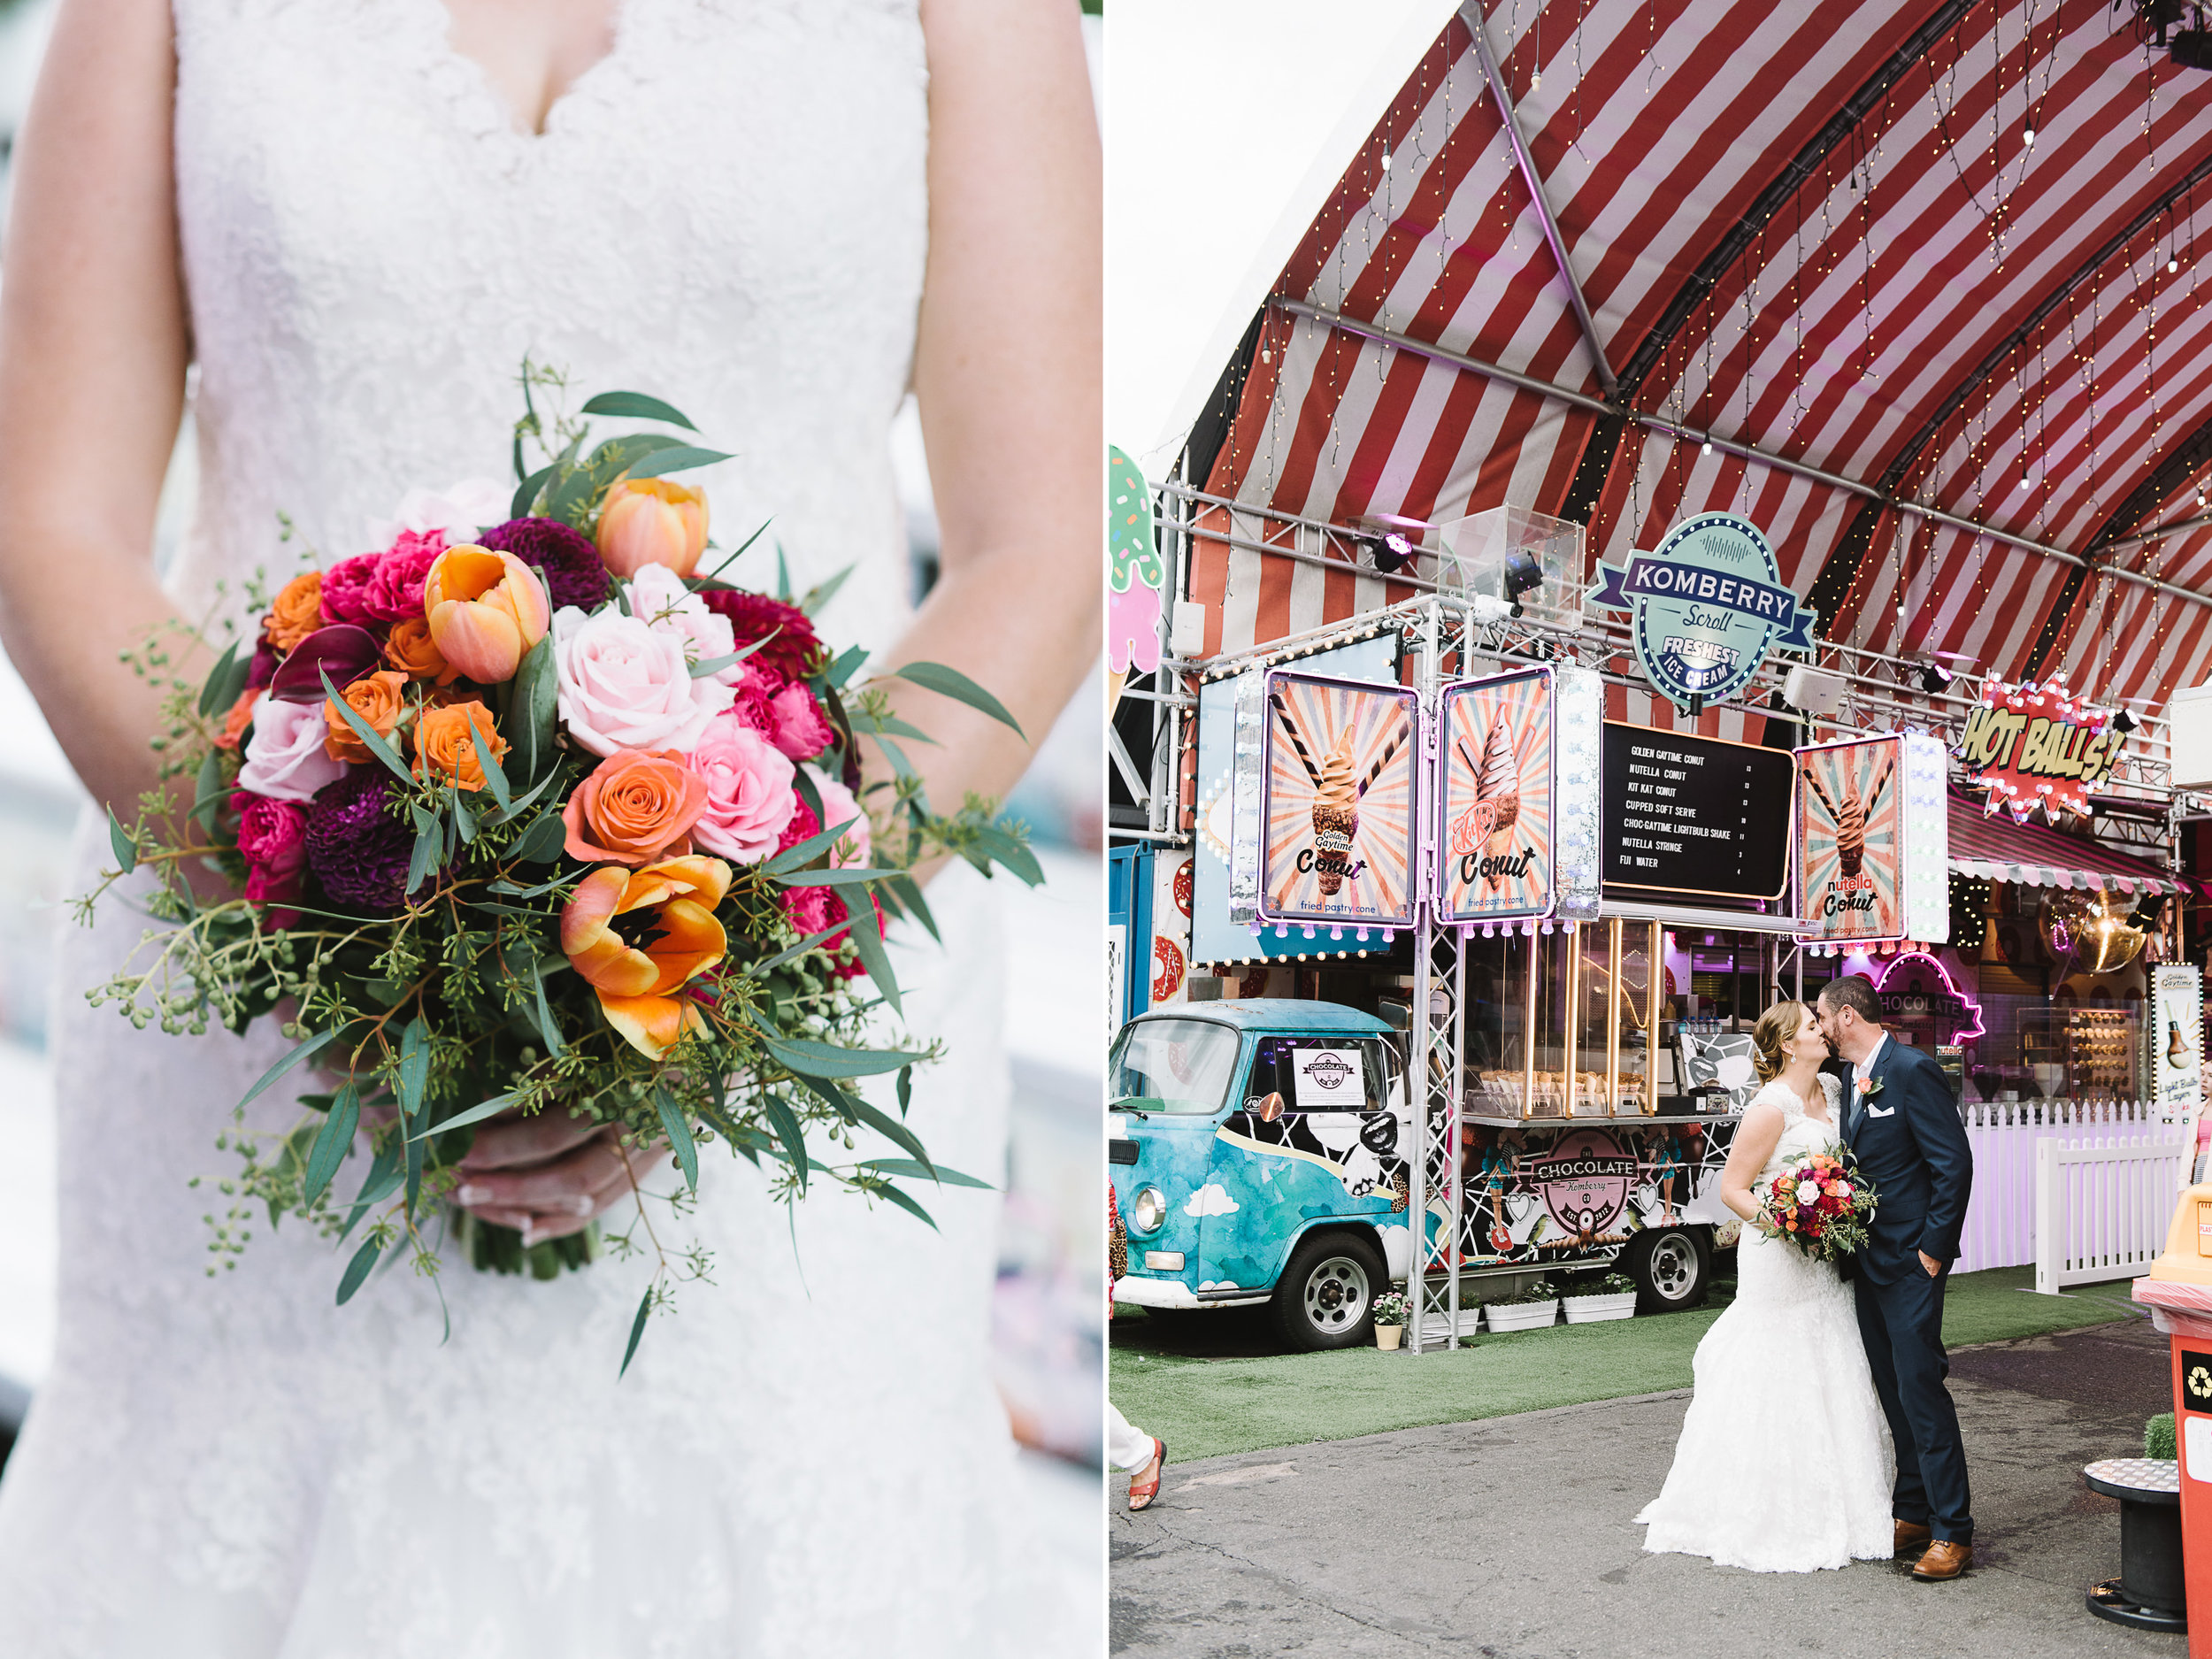 Eat-Street-Market-Wedding-2.jpg